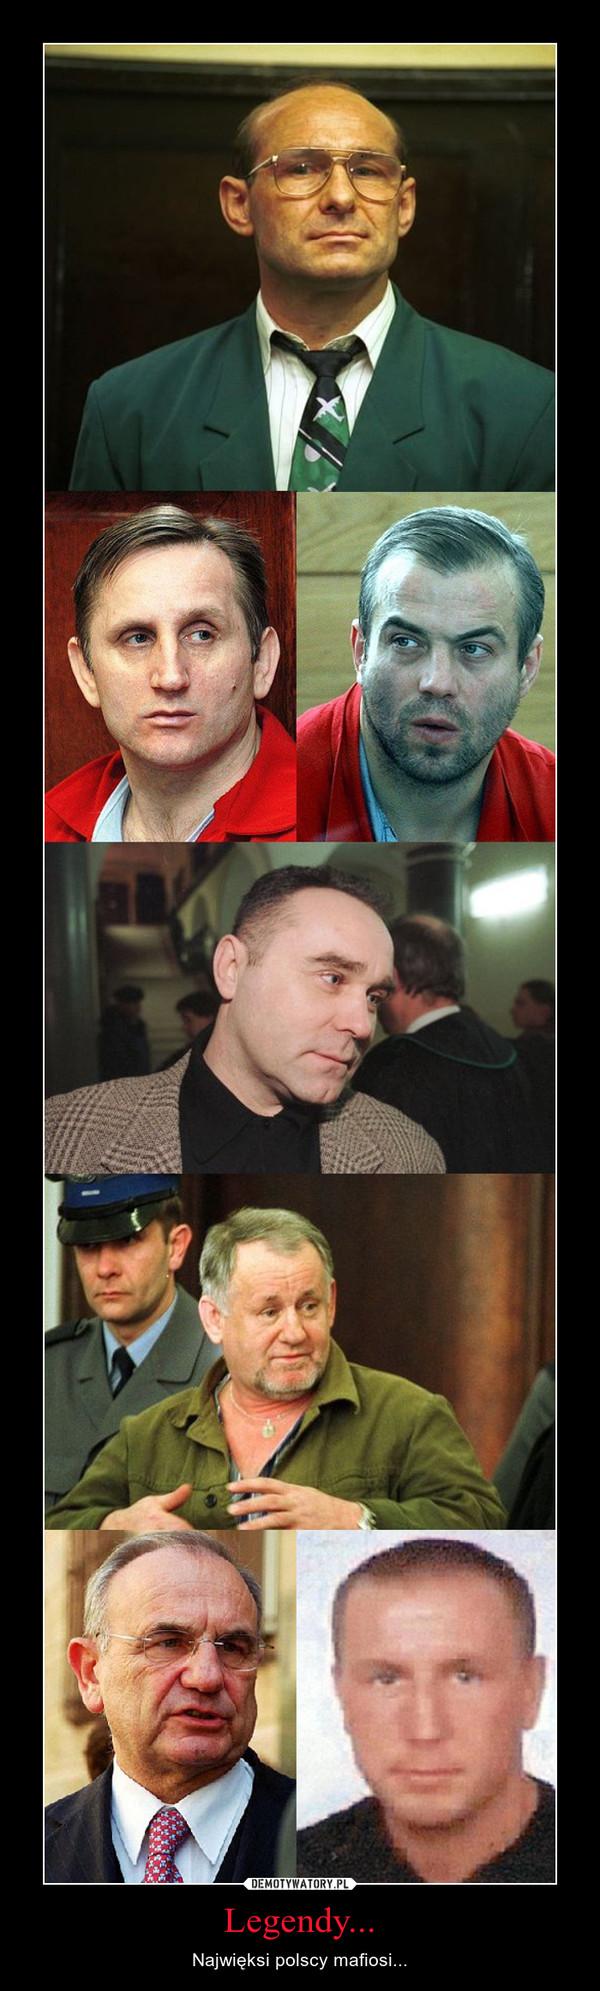 Legendy... – Najwięksi polscy mafiosi...